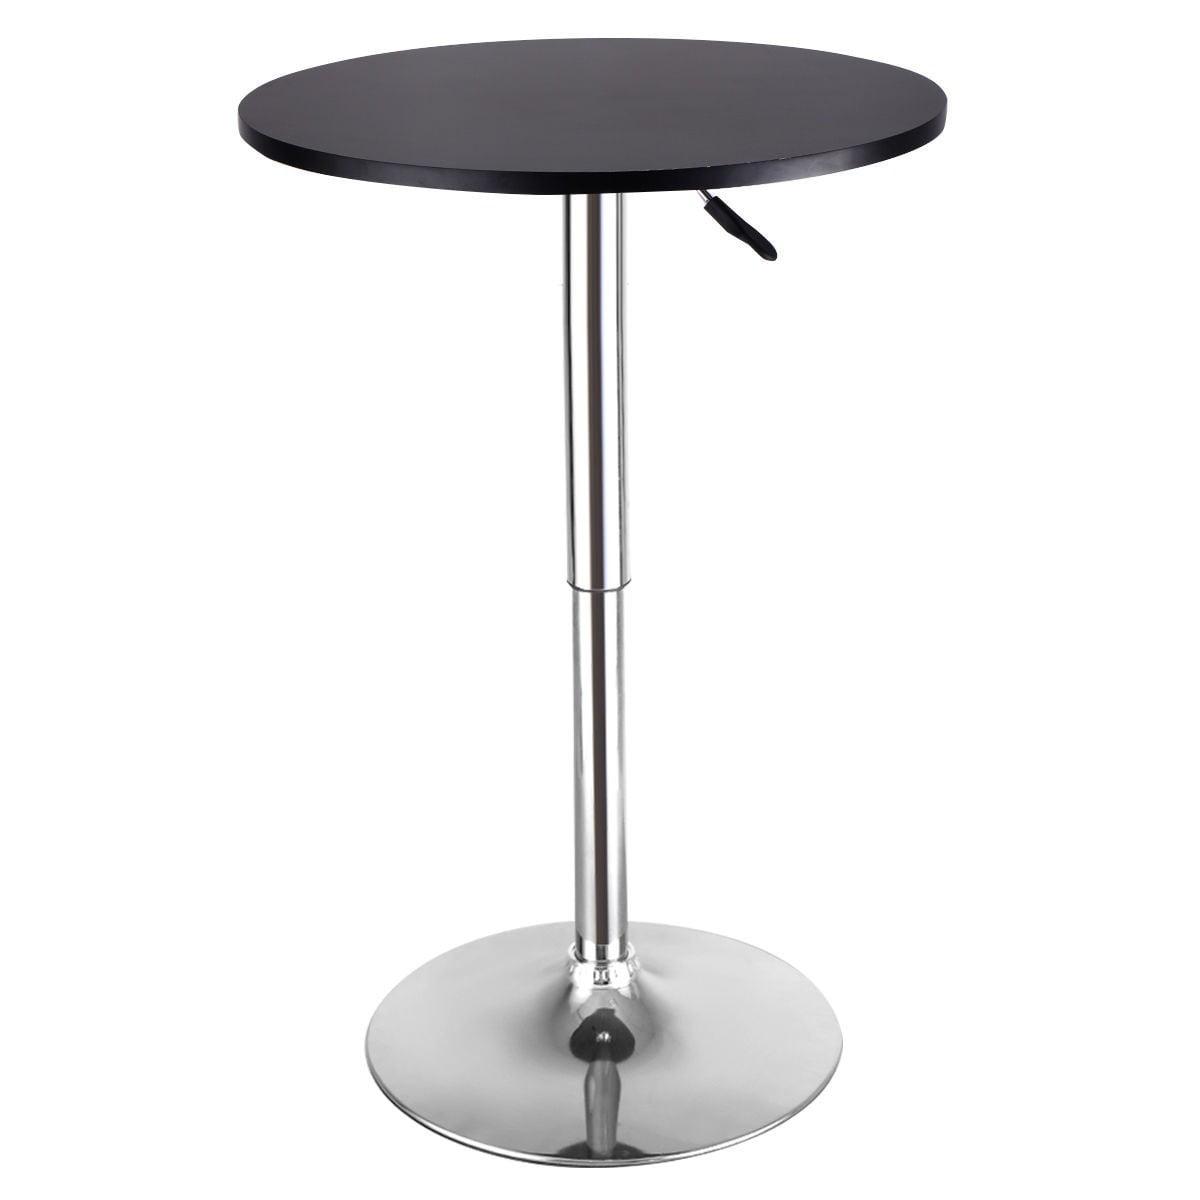 Modern Round Bar Table Adjustable Bistro Pub Counter Wood...